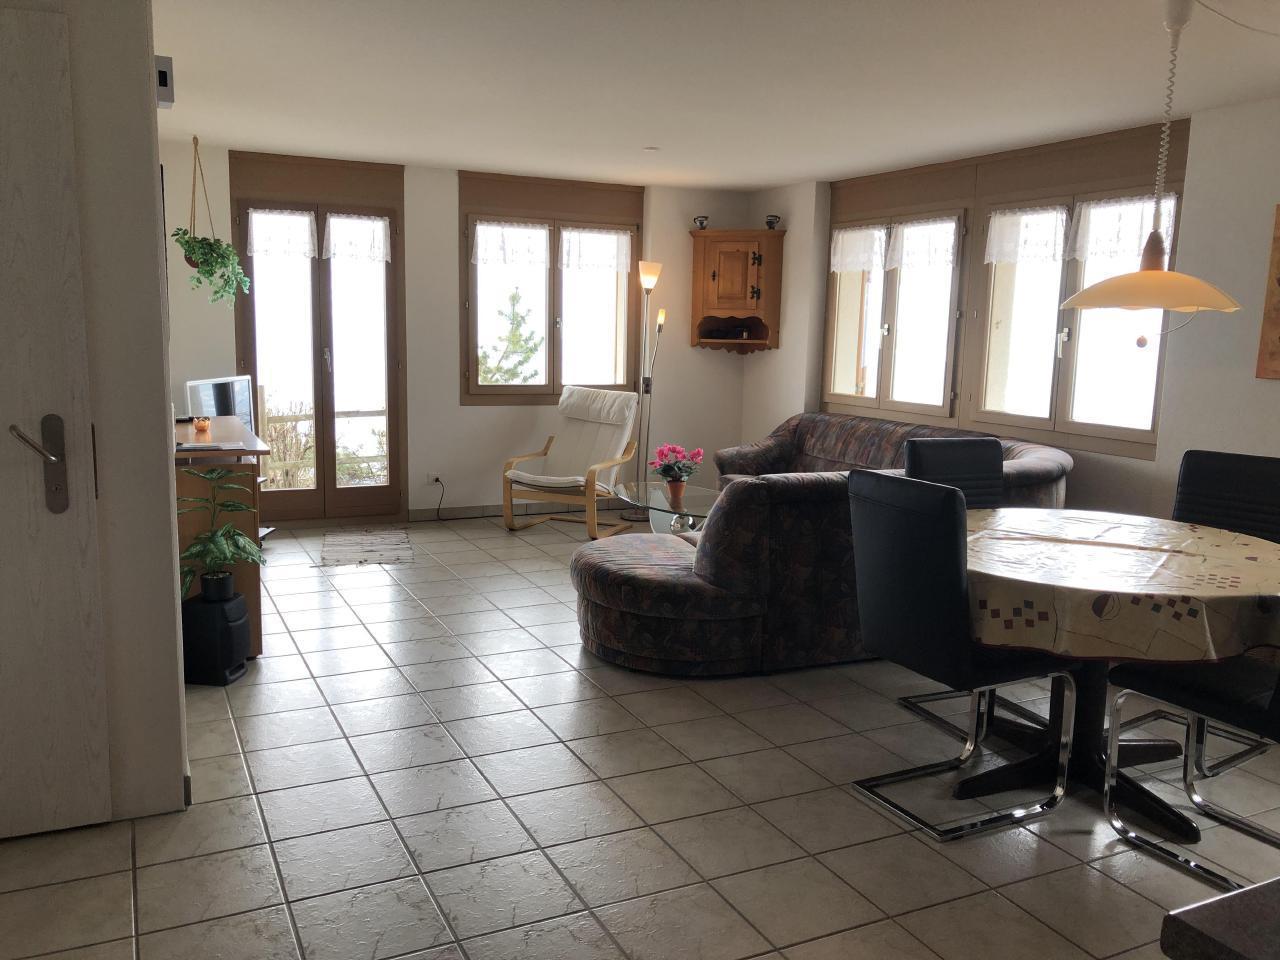 Appartement de vacances Chalet Wieseli 4-Bettwohnung (2692215), Hasliberg Wasserwendi, Meiringen - Hasliberg, Oberland bernois, Suisse, image 8